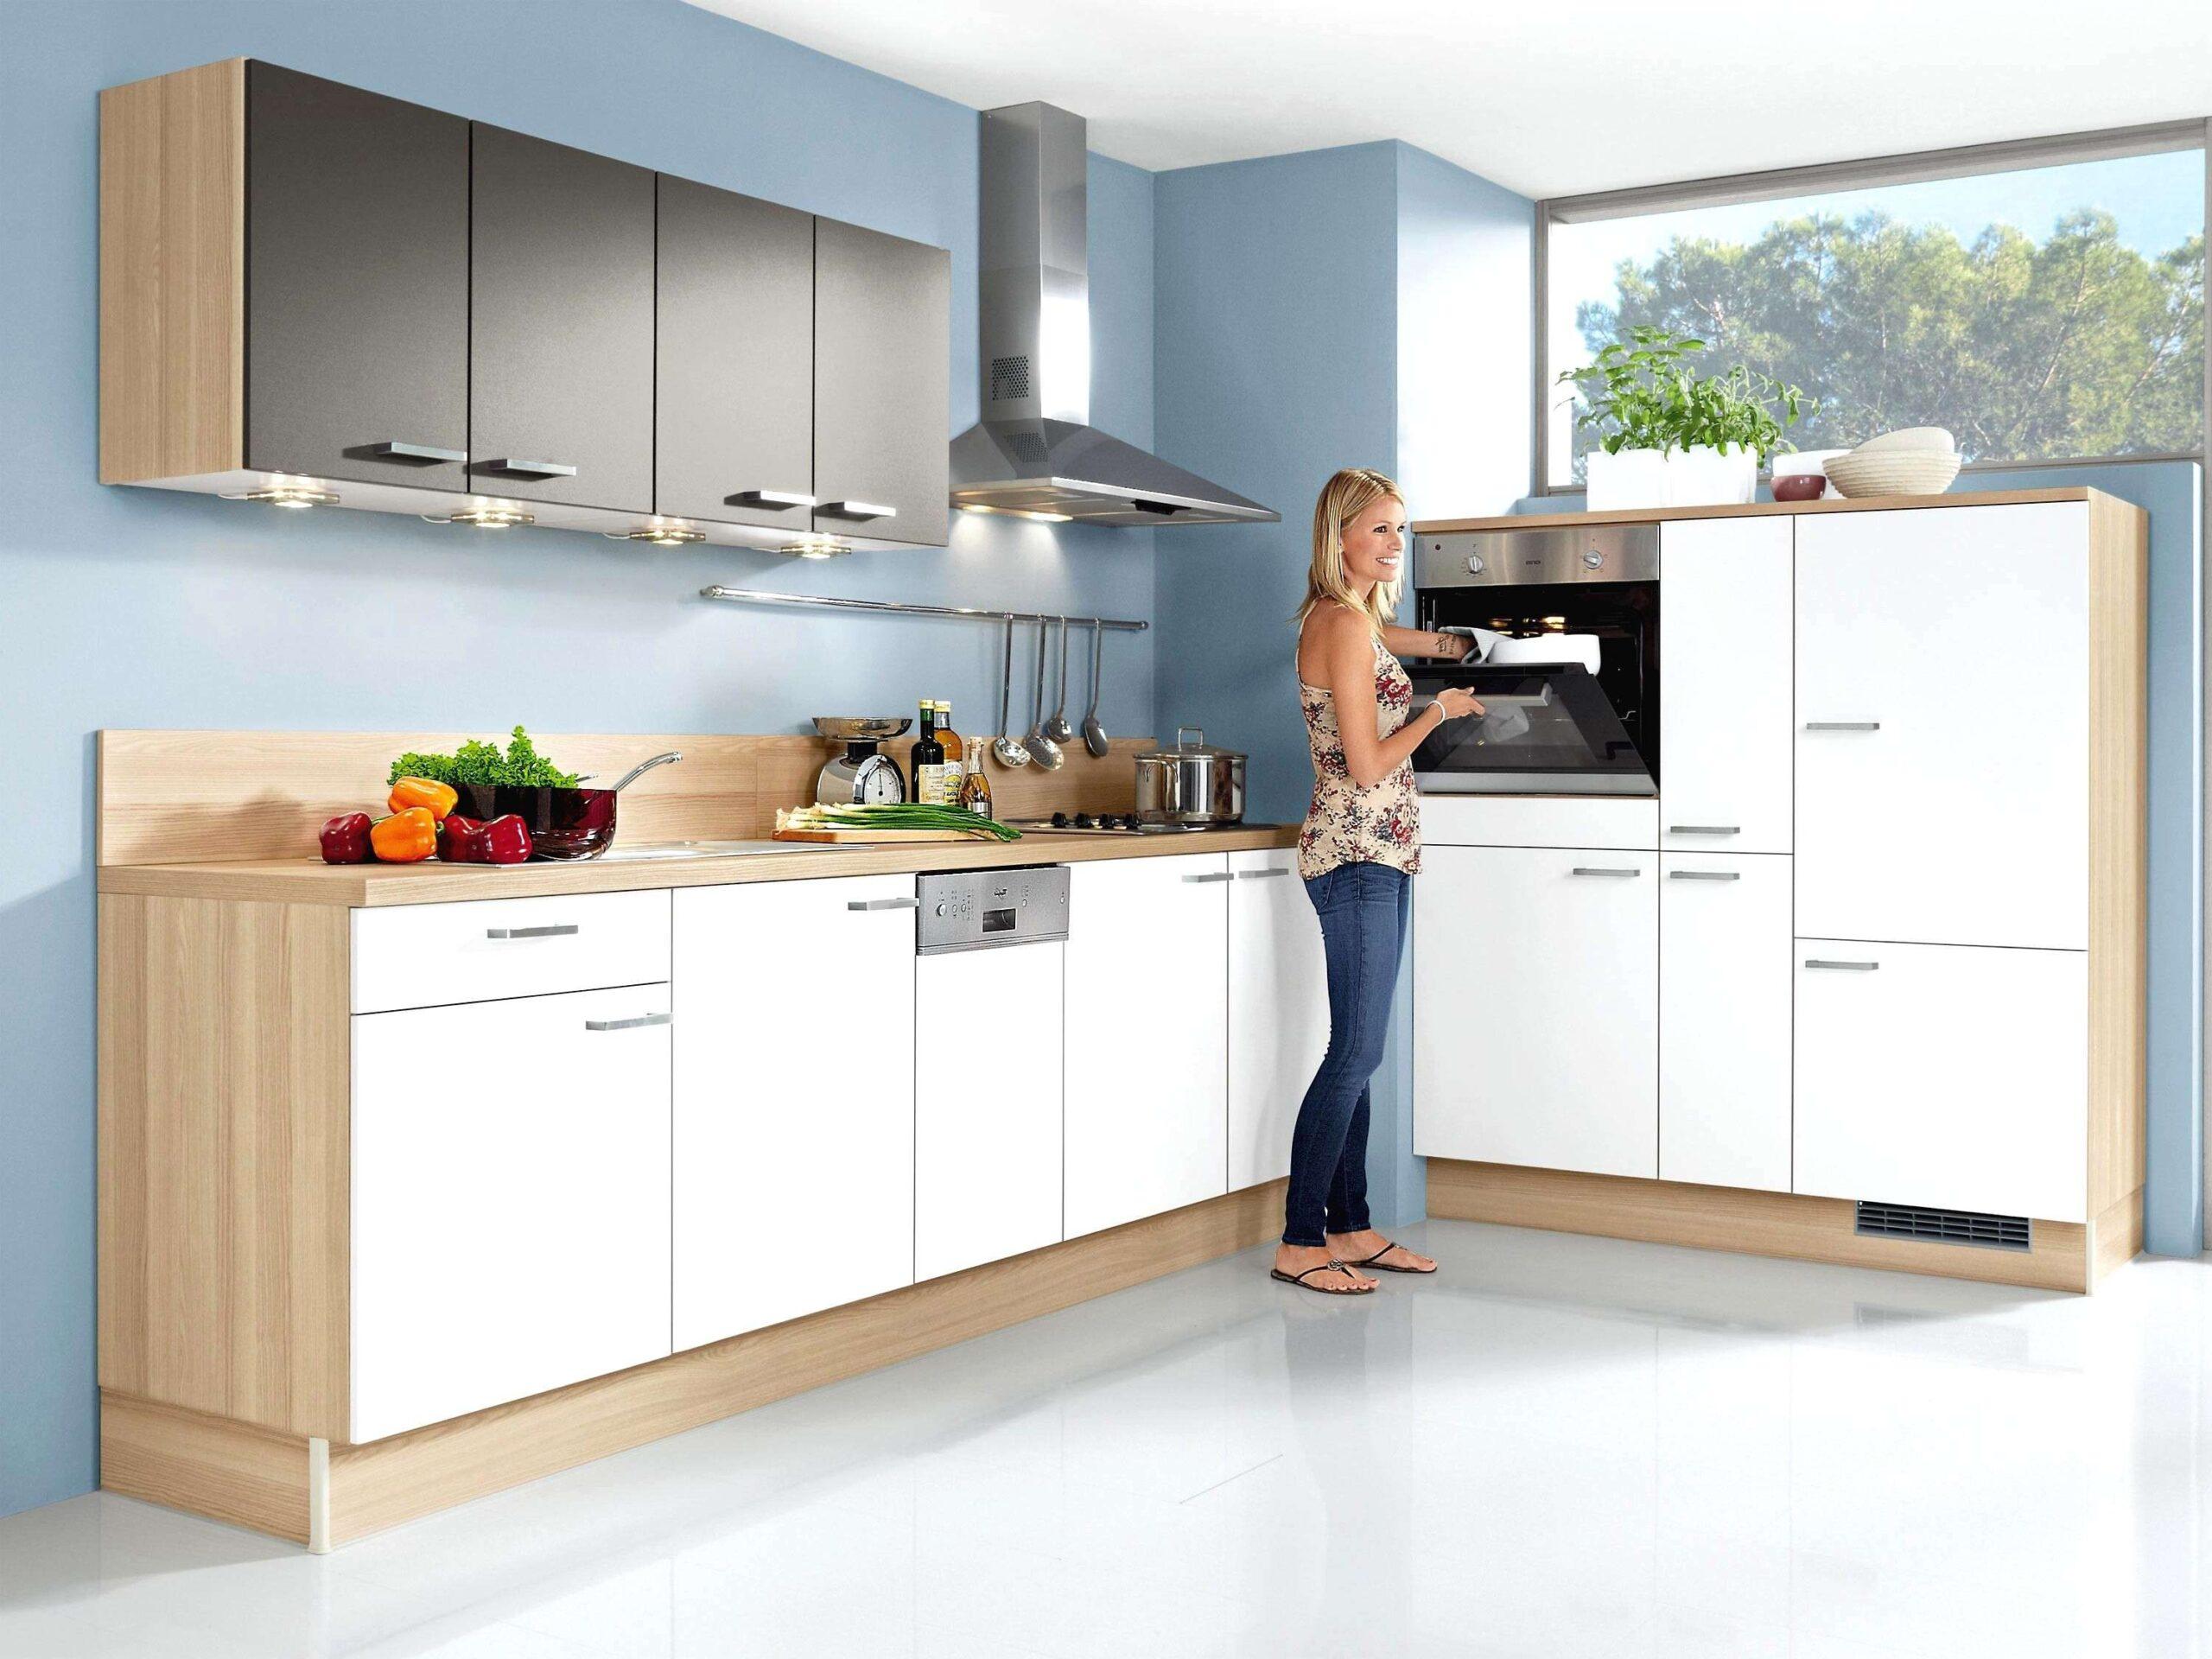 Full Size of 43 Luxus Roller Kchen Beratung Kitchen Regale Küchen Regal Wohnzimmer Küchen Roller